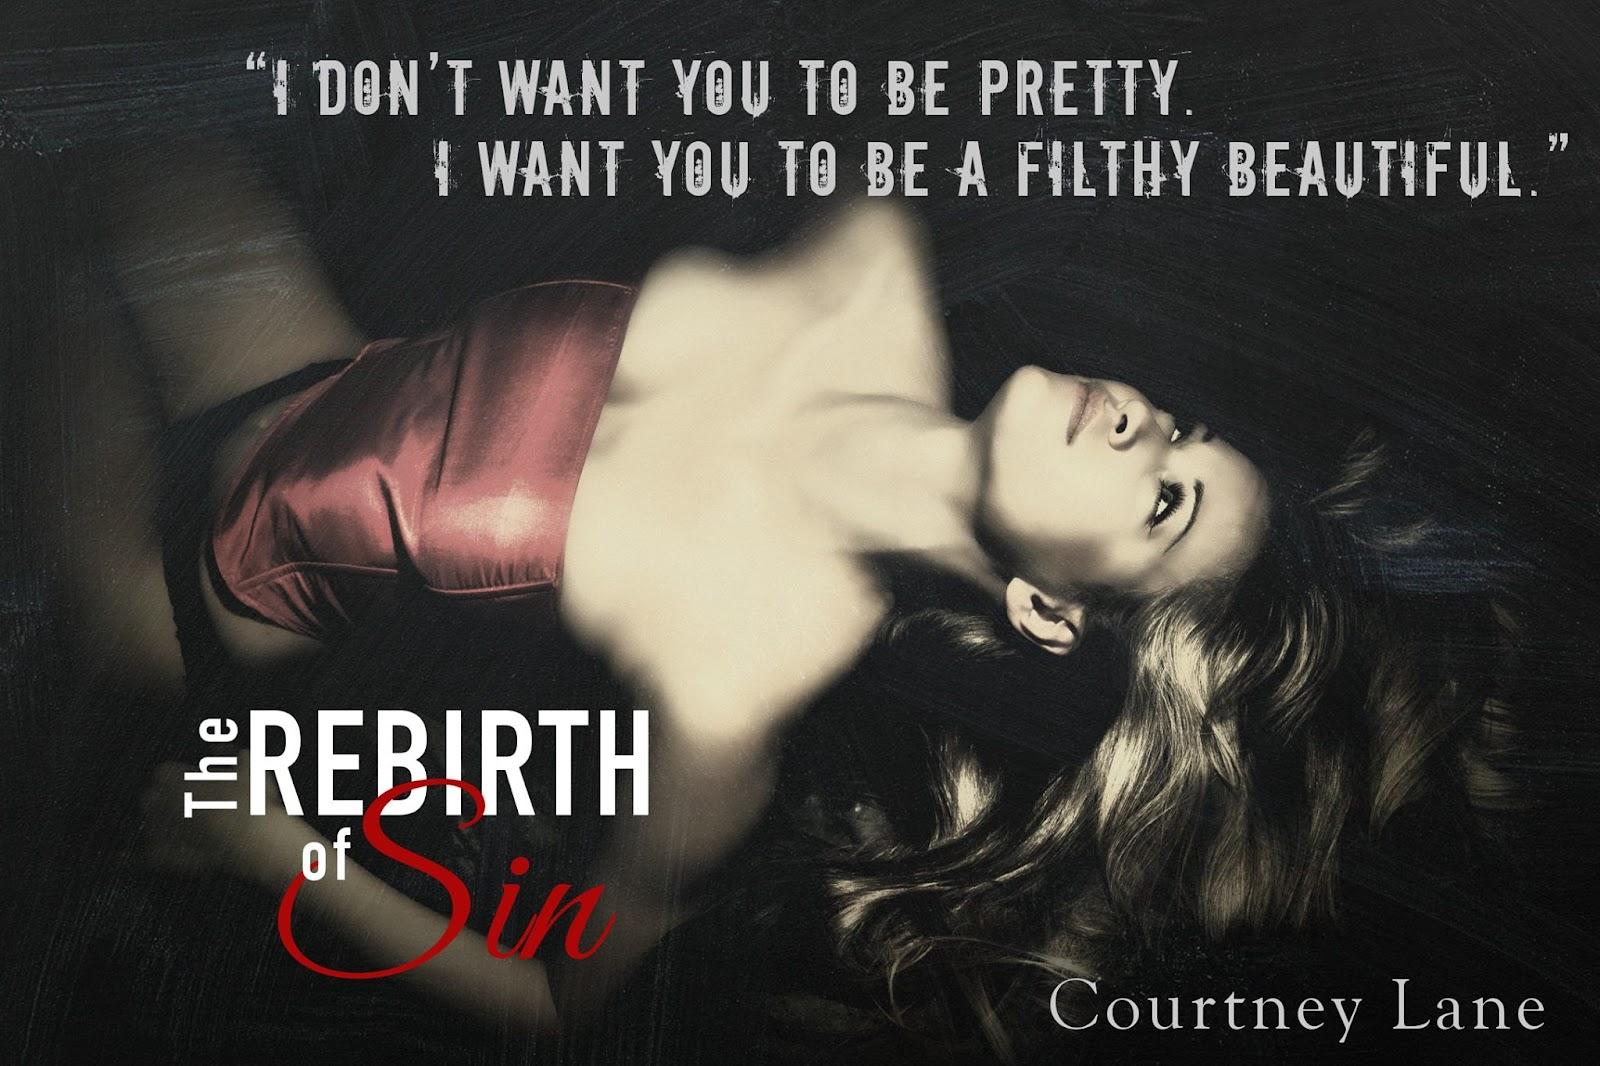 rebirth teaser.jpg